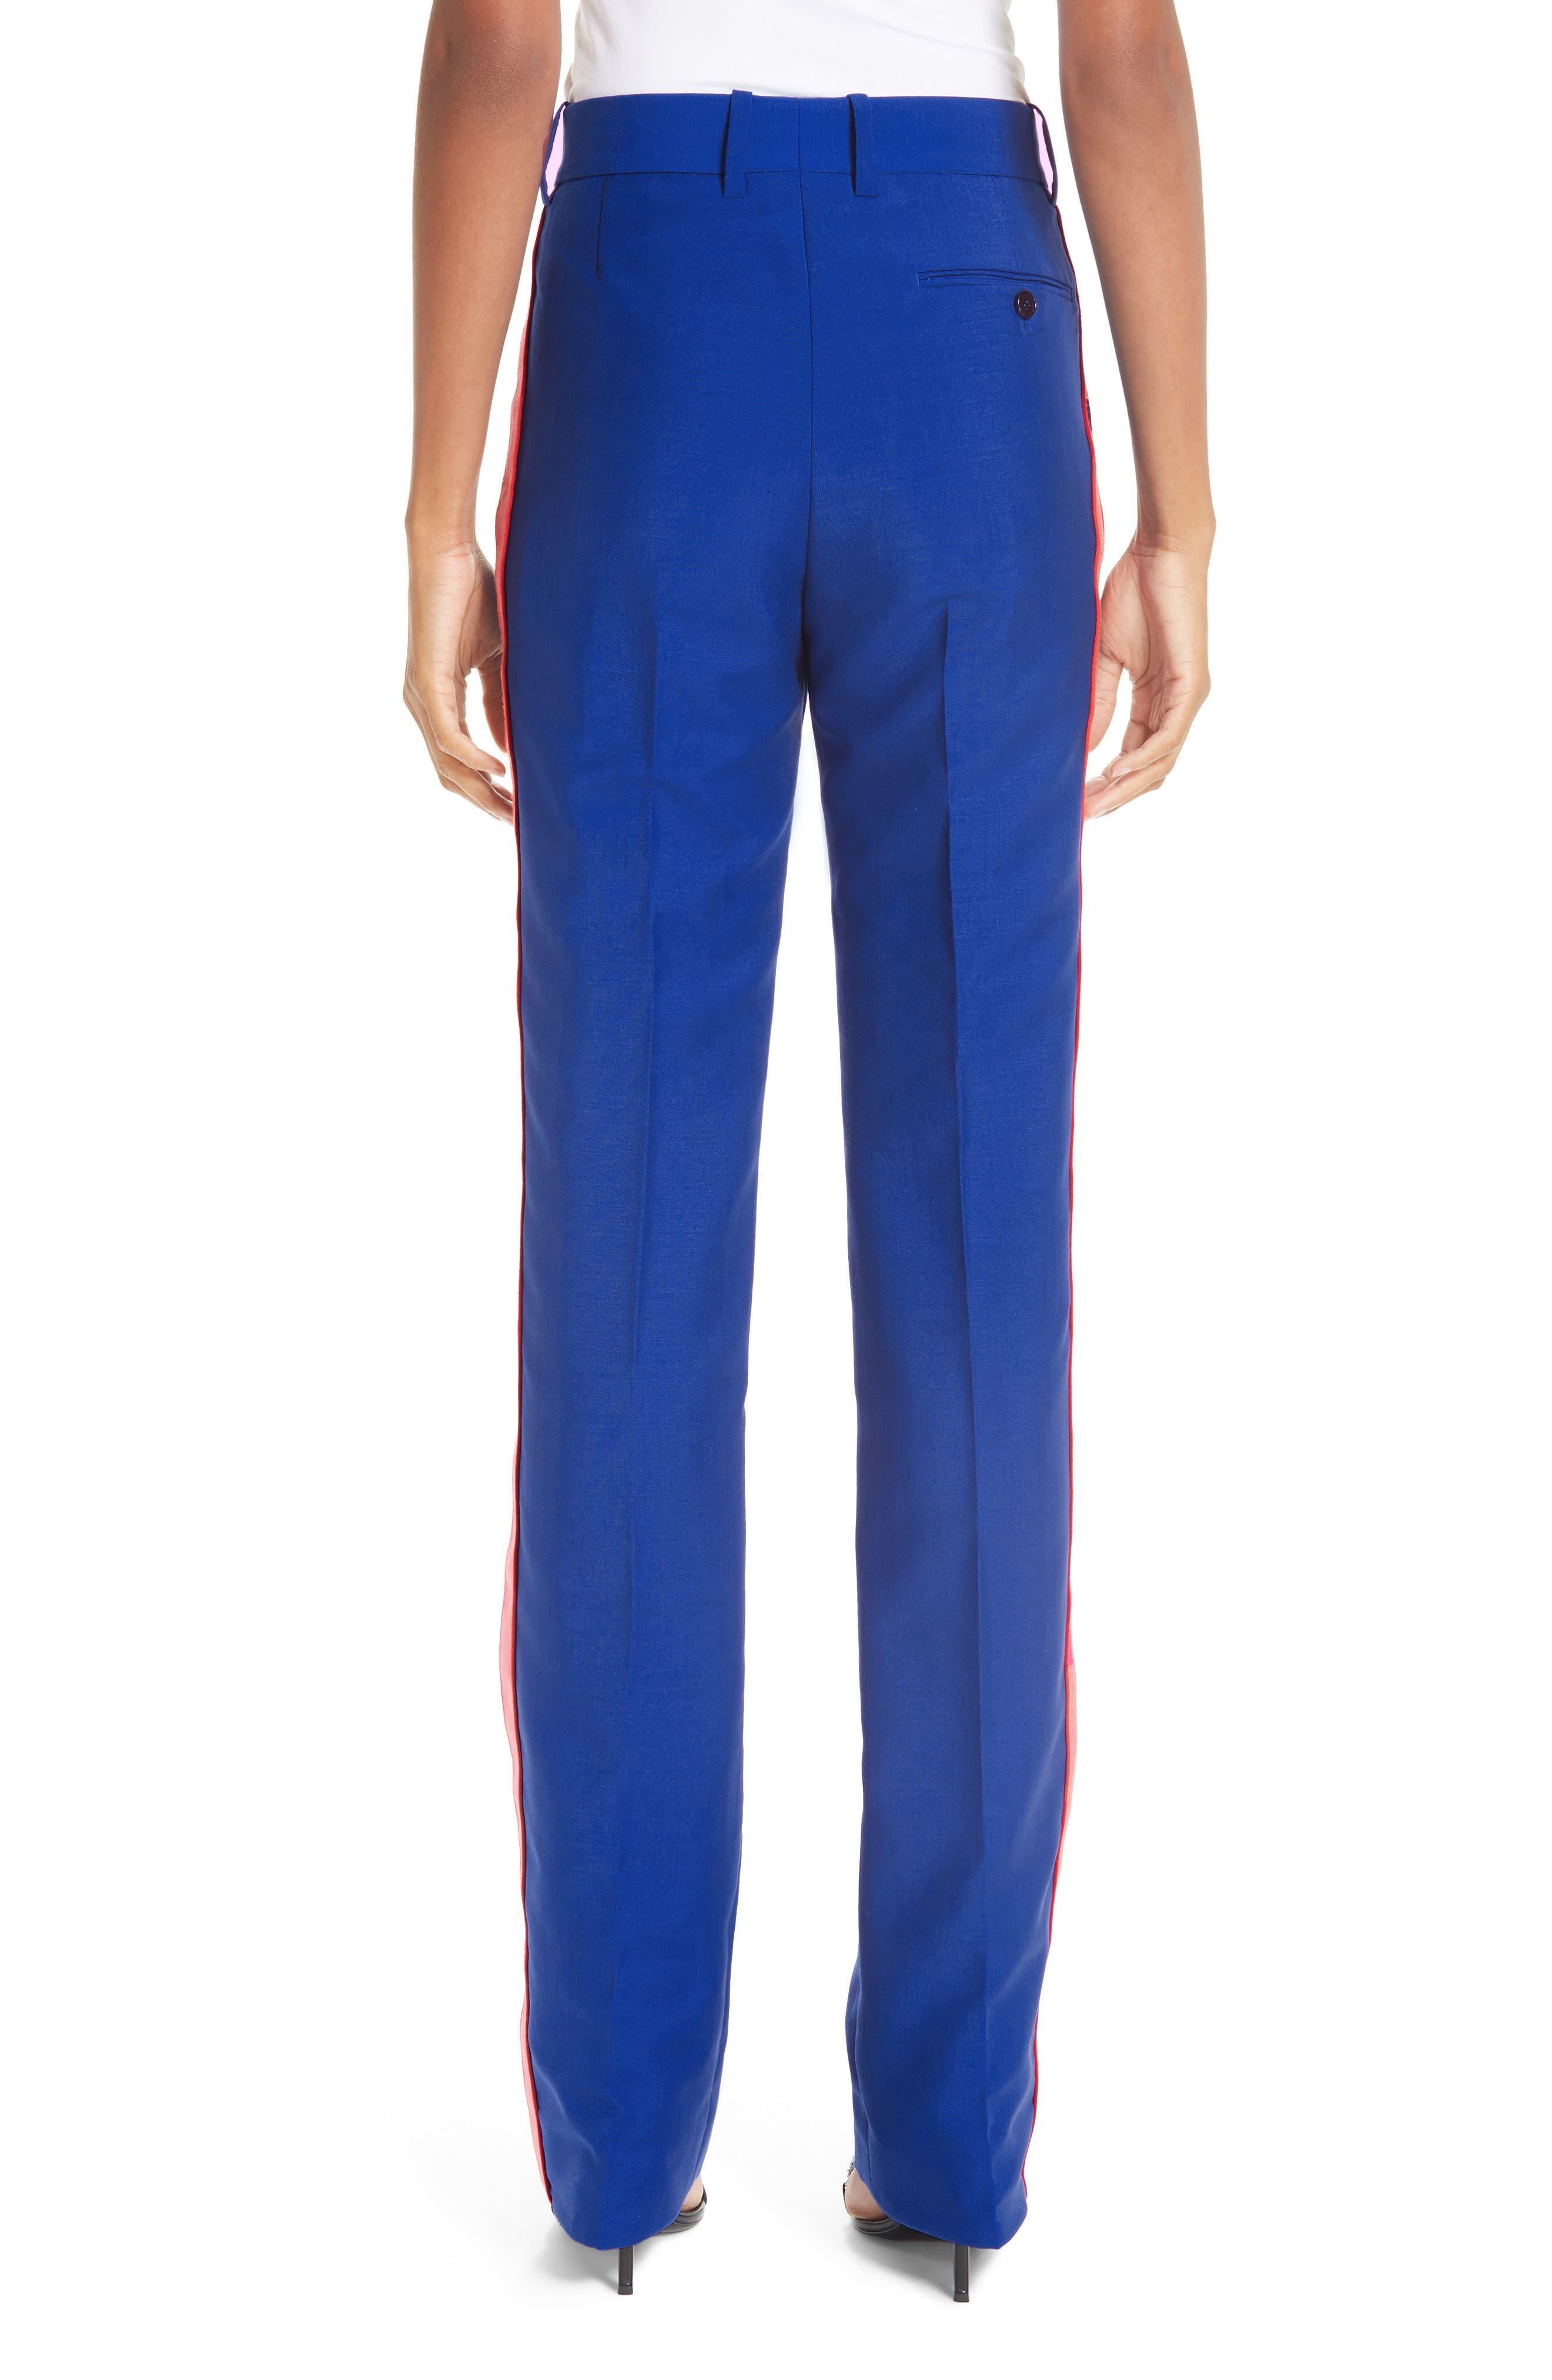 CALVIN KLEIN 205W39NYC, Side Stripe Mohair & Wool Straight Leg Pants, Alternate thumbnail 2, color, BRIGHT BLUE